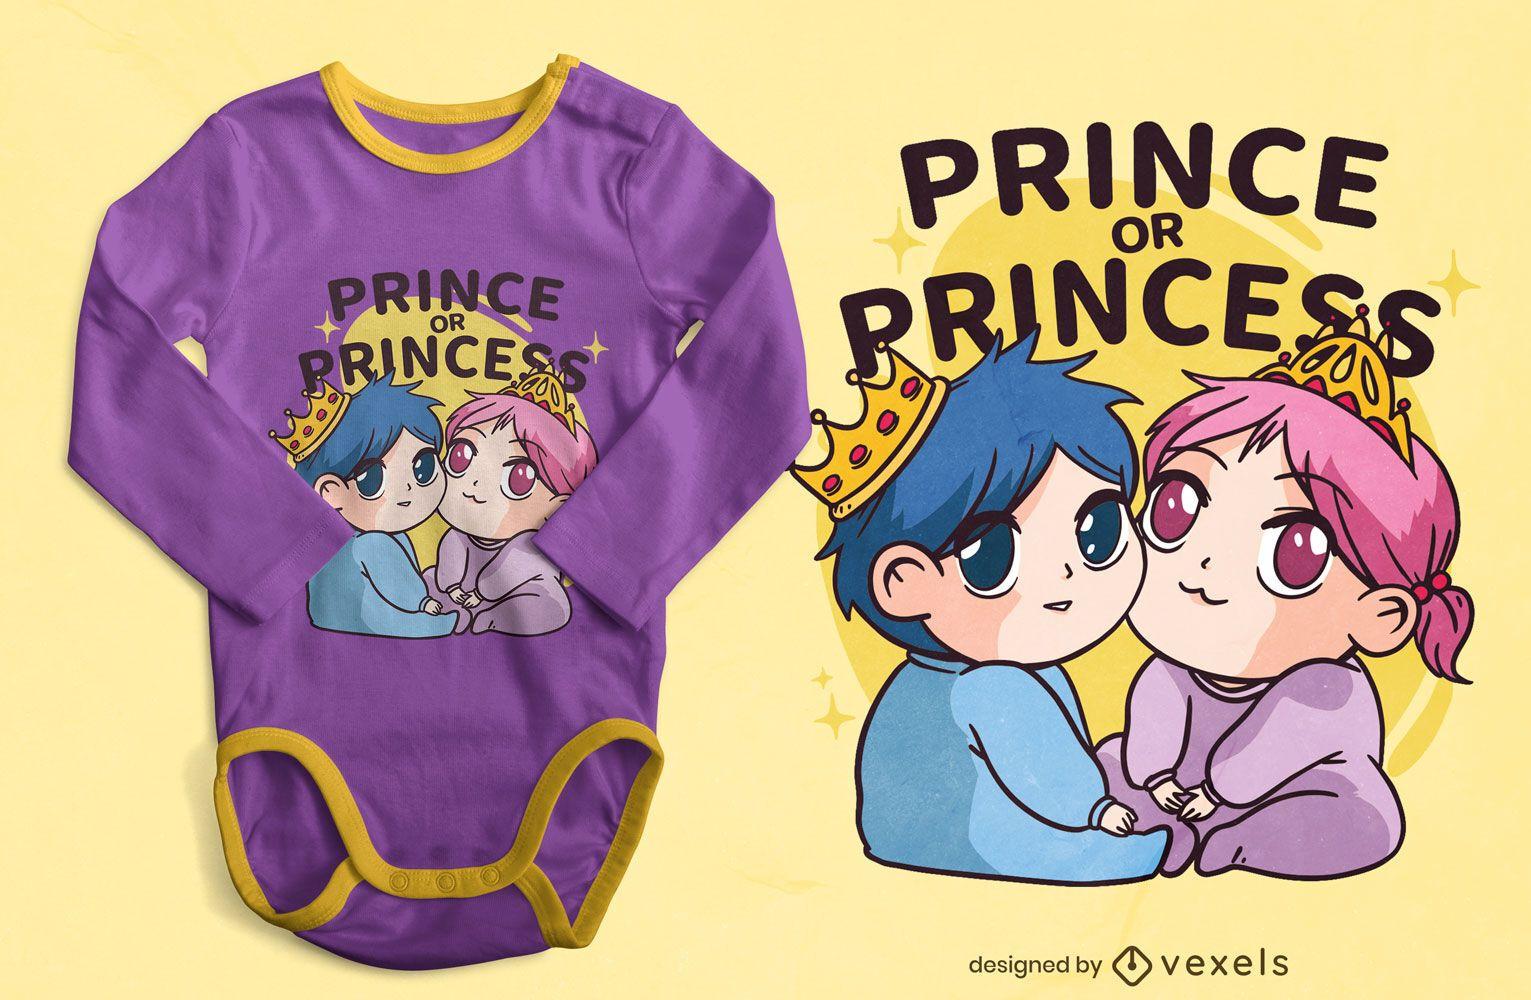 King and queen babies t-shirt design